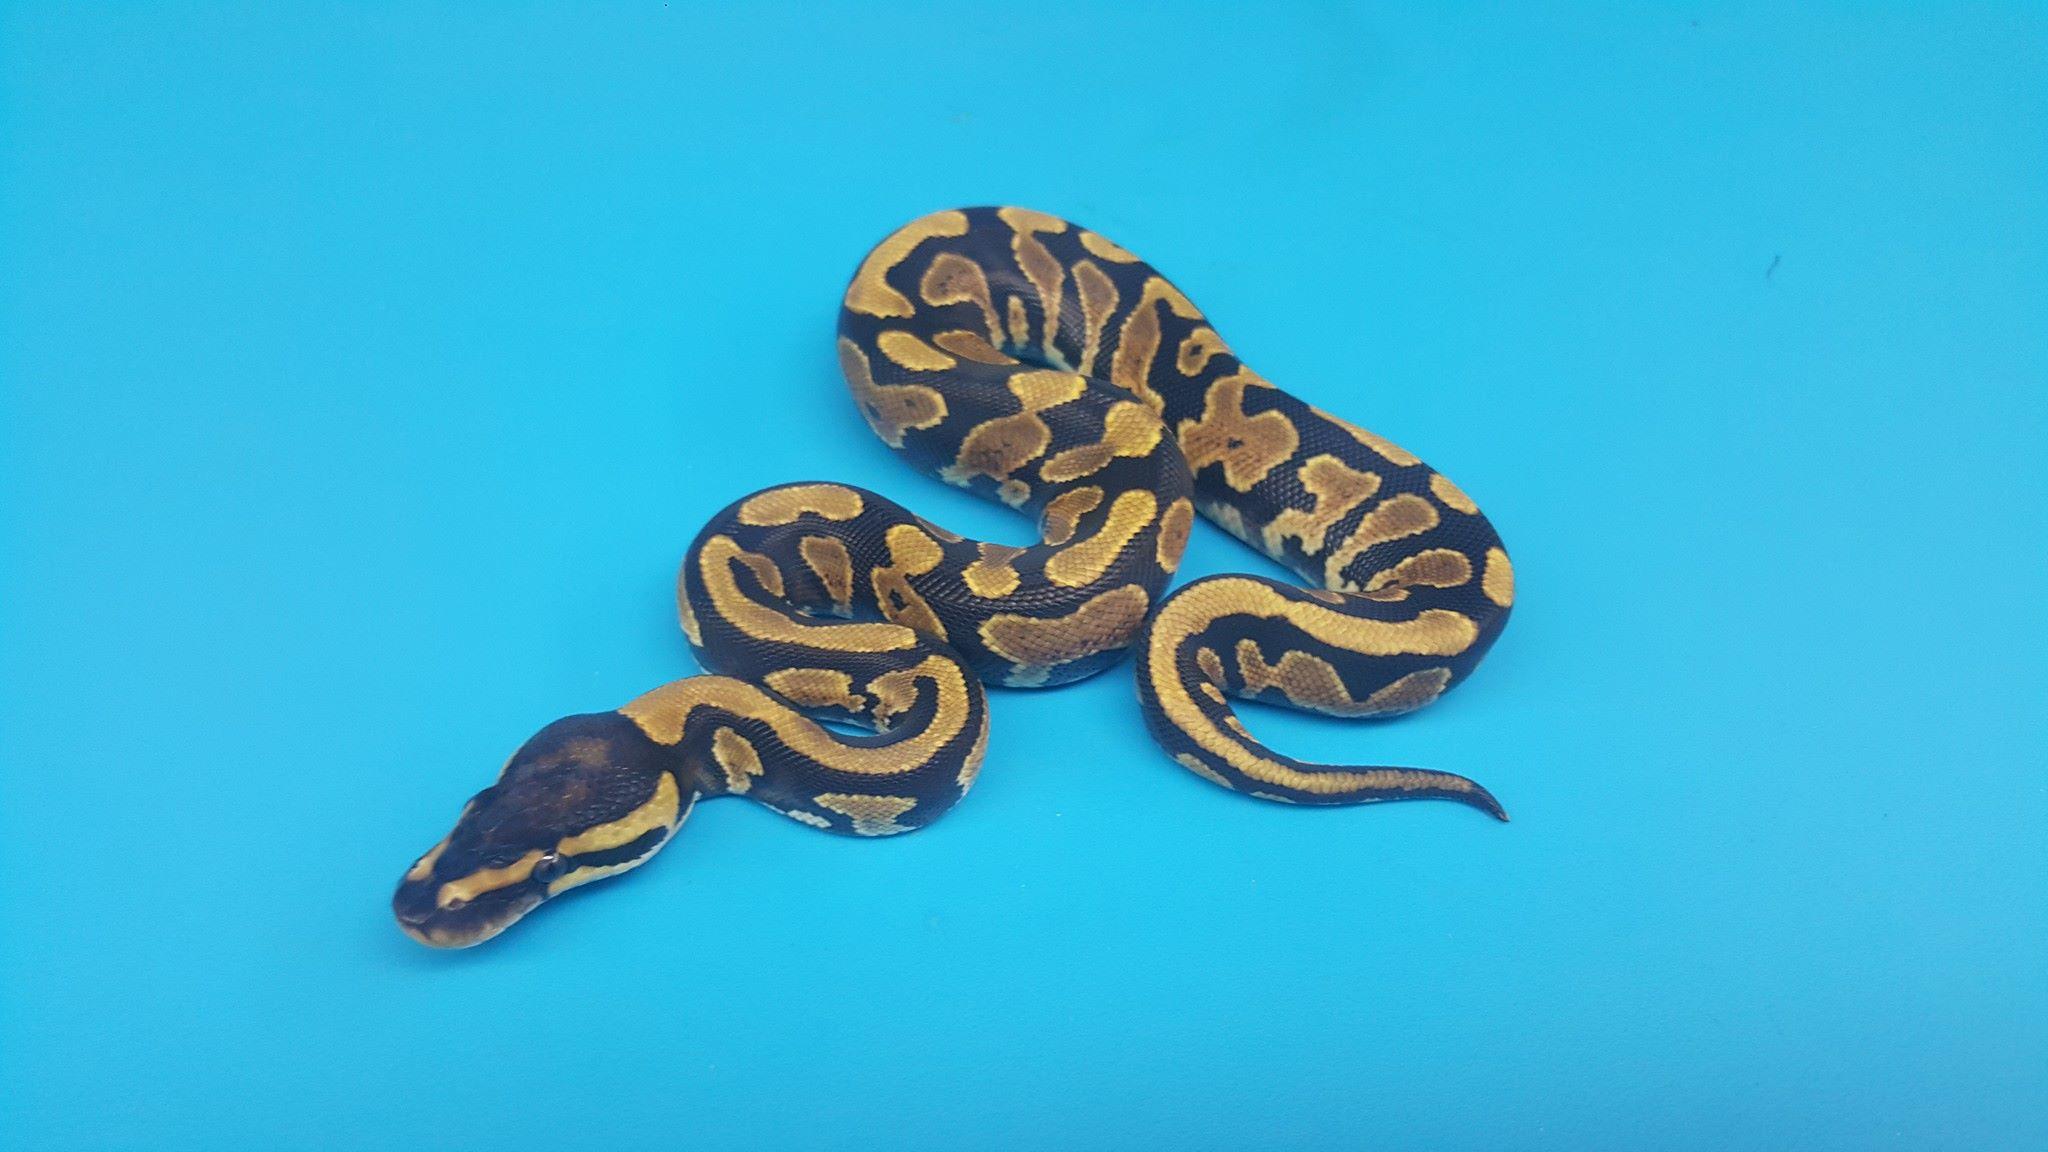 Pied clown ball python - photo#14